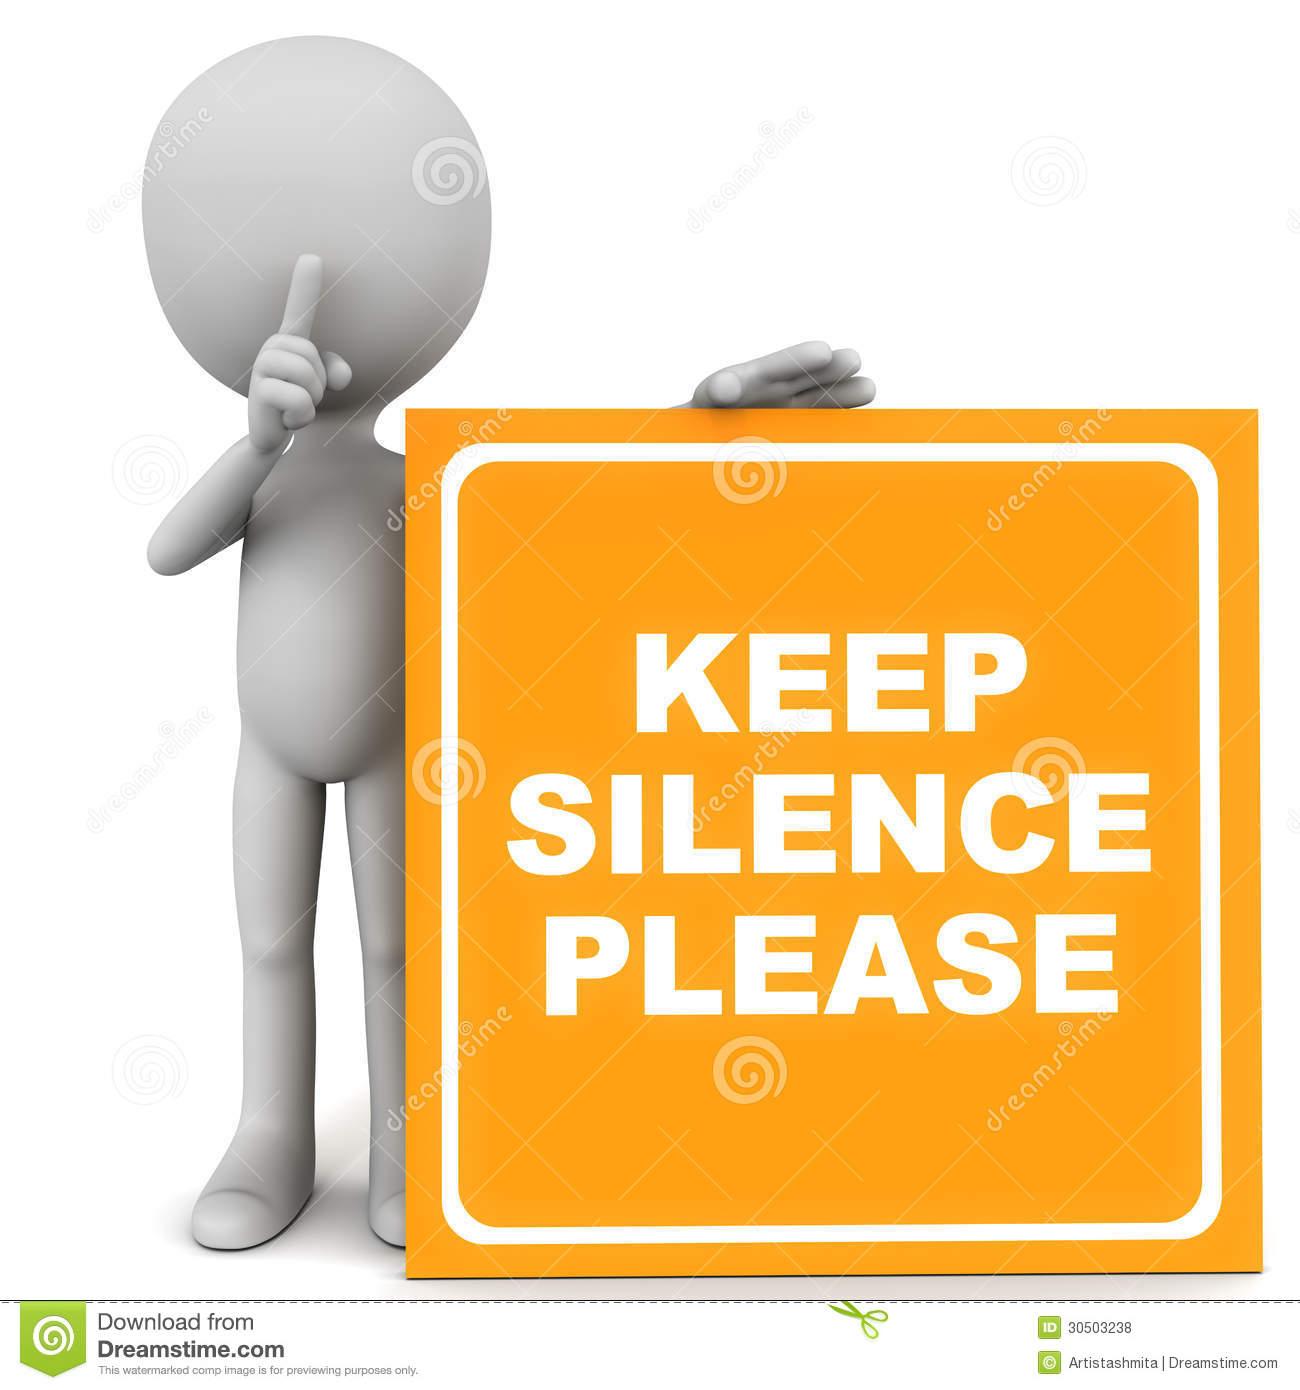 Silence please clipart 9 » Clipart Station.